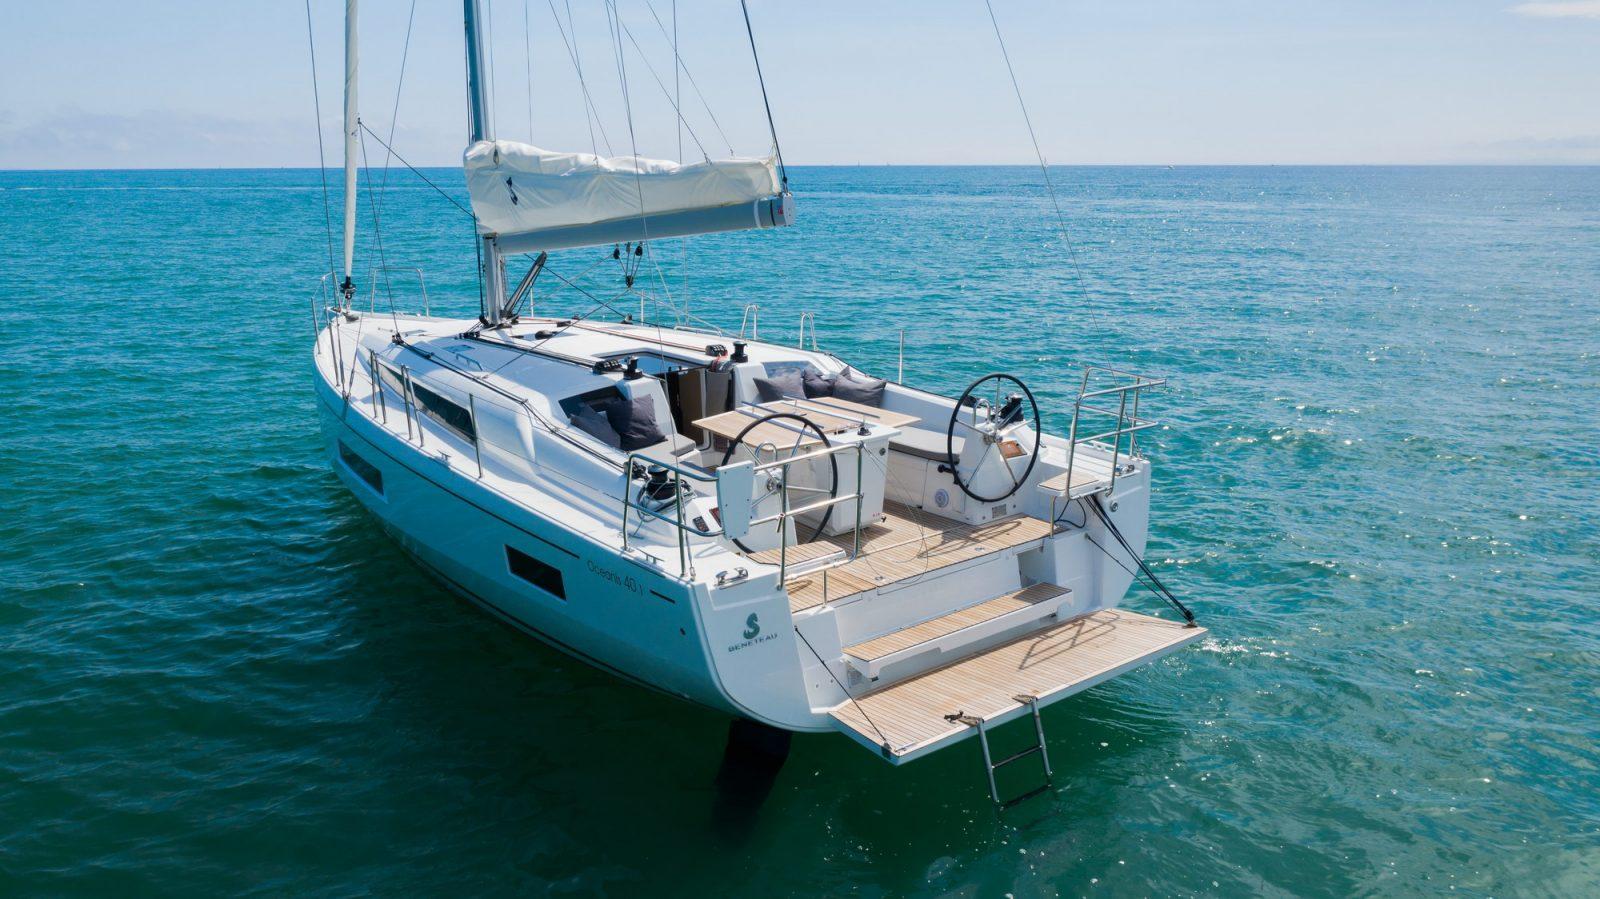 Du thuyền Beneteau Oceanis 40.1